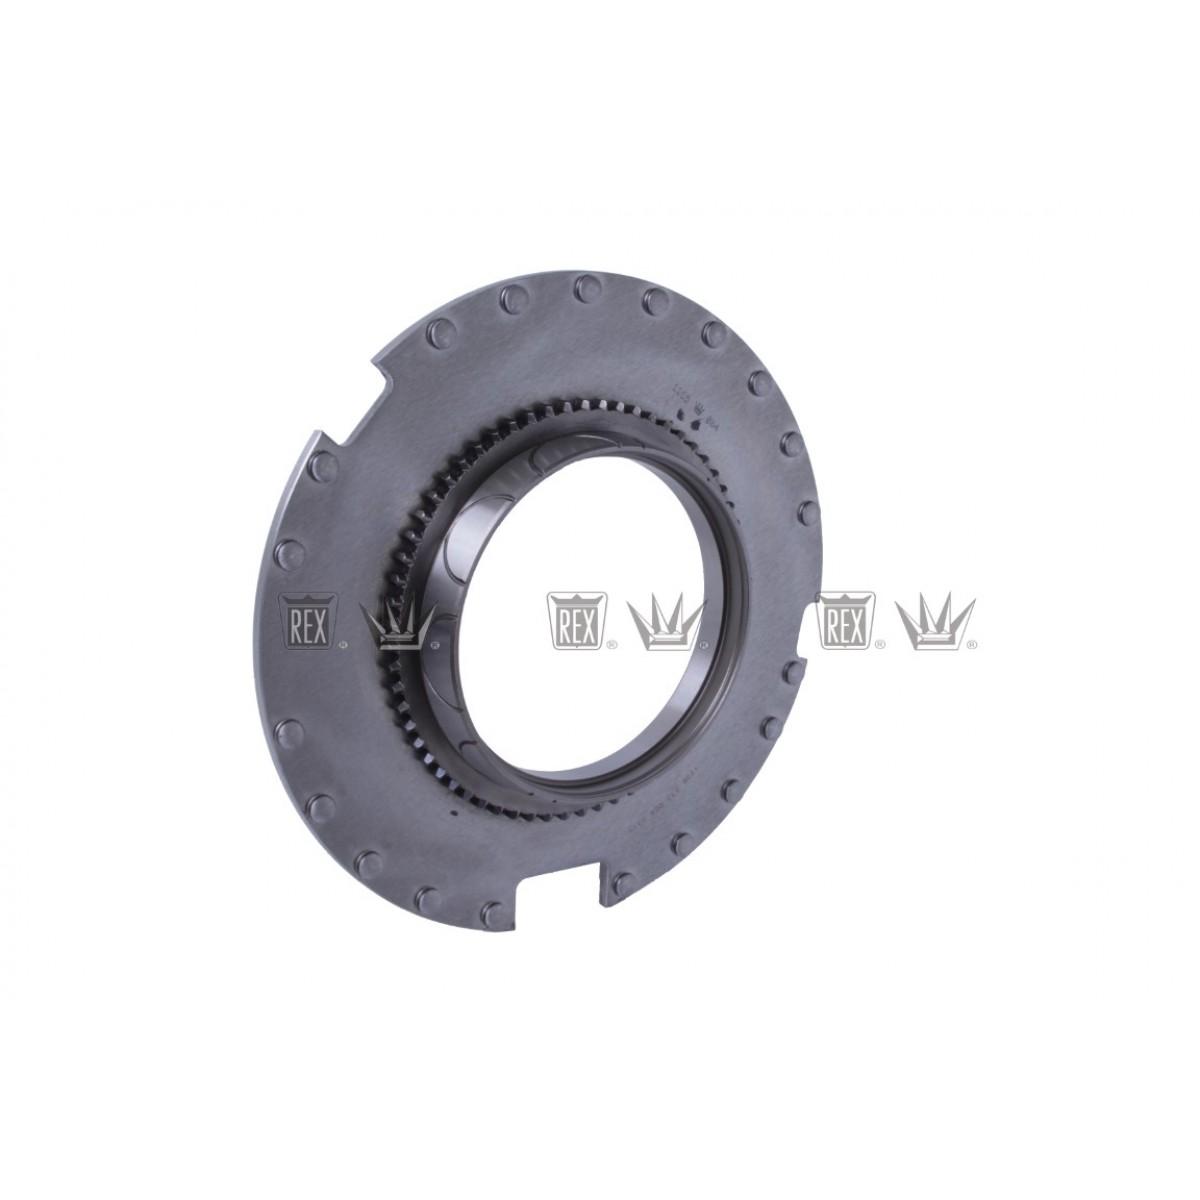 Cone sincronizado caixa cambio ZF - 16S-130/160/1650 ZF 16S - 1650